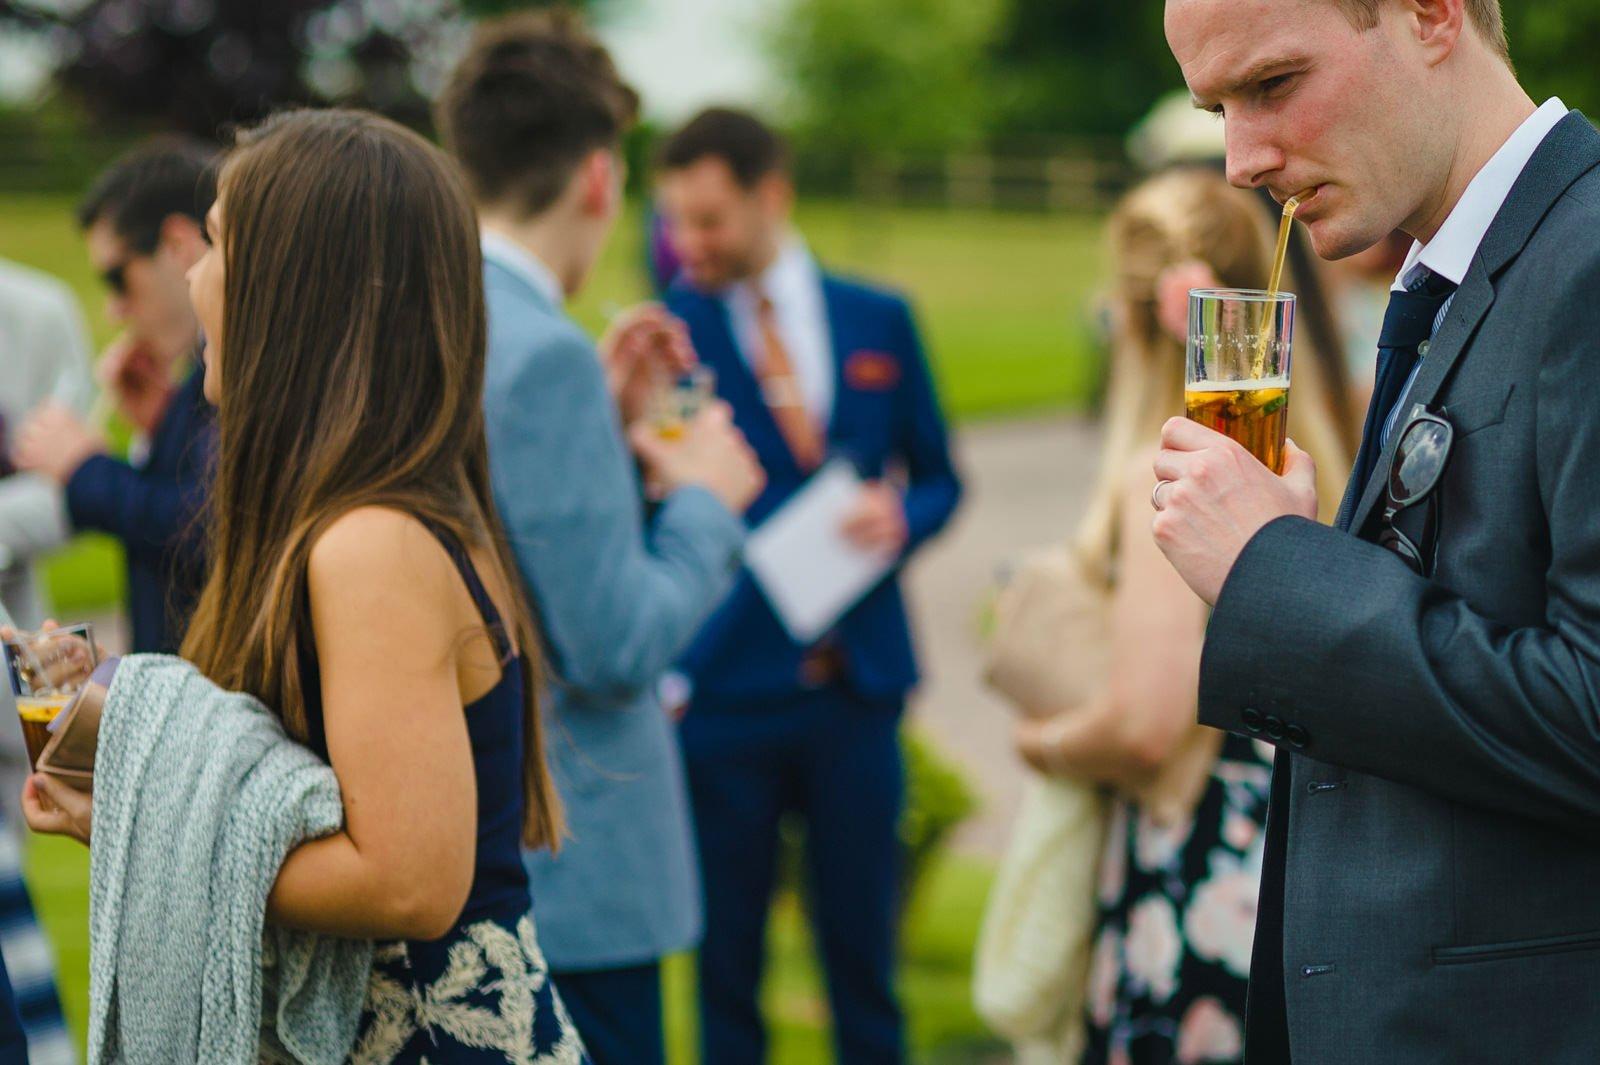 Millers Of Netley wedding, Dorrington, Shrewsbury | Emma + Ben 46